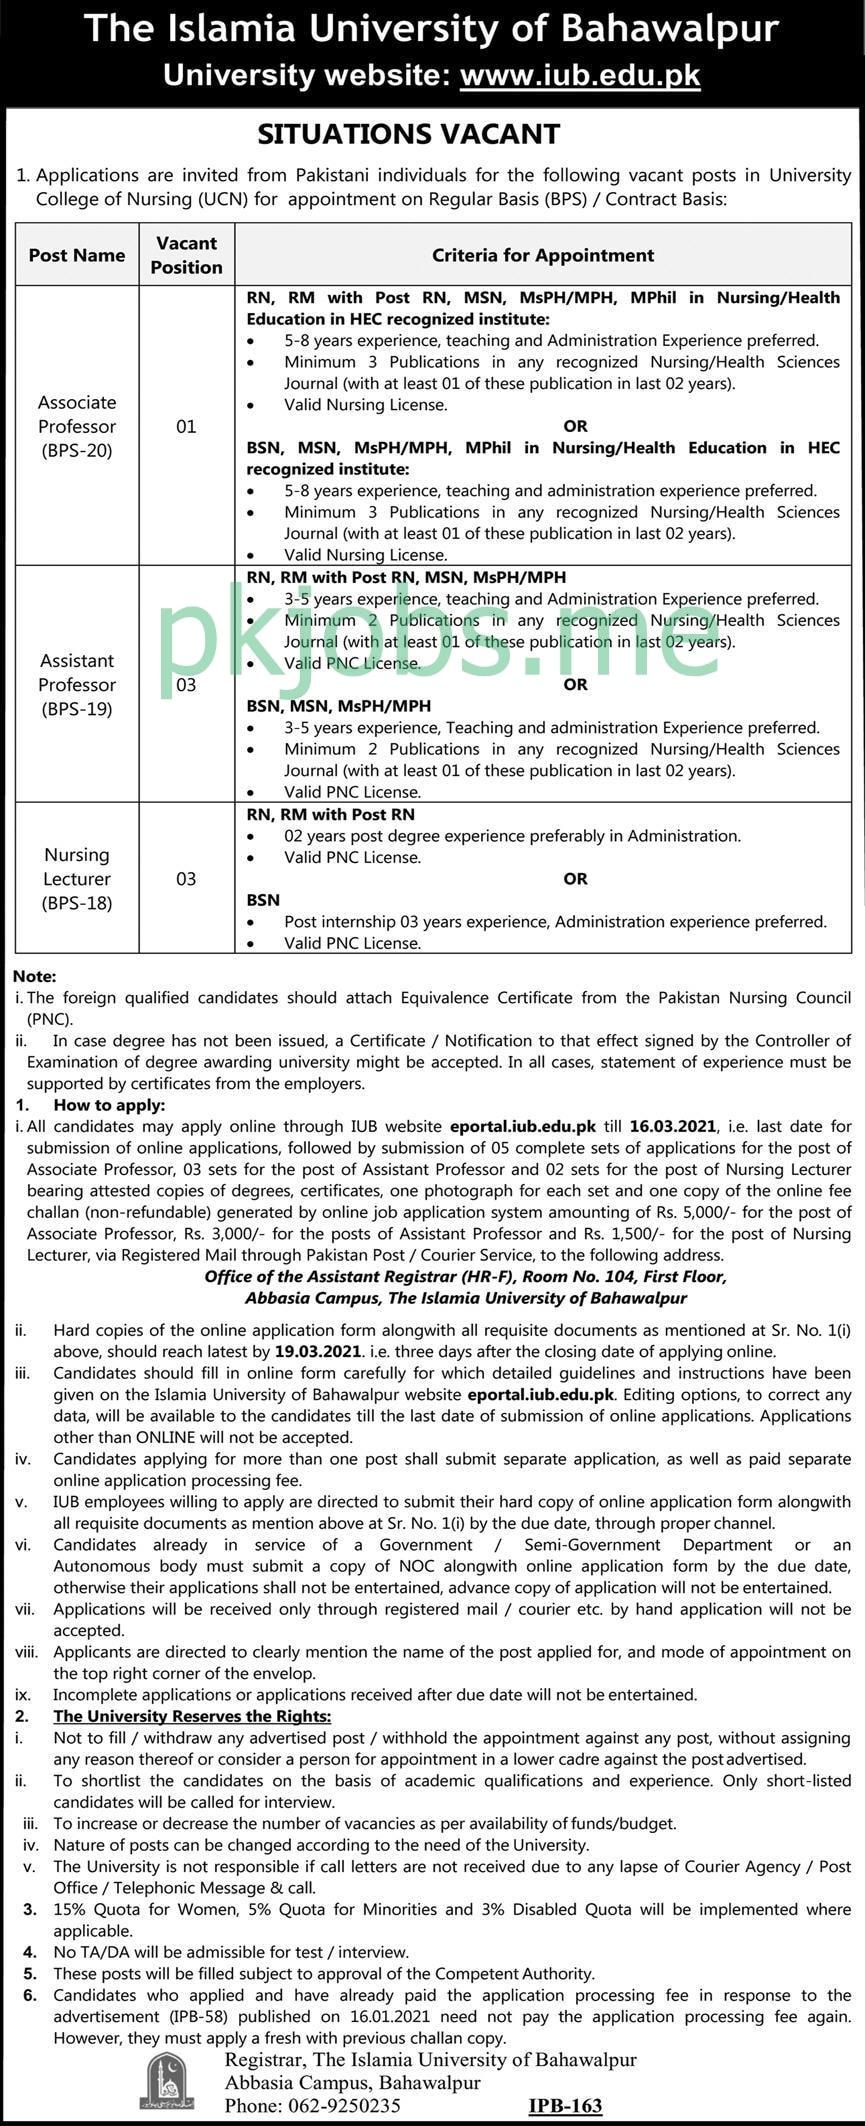 Latest The Islamia University of Bahawalpur Posts 2021 Ad-2